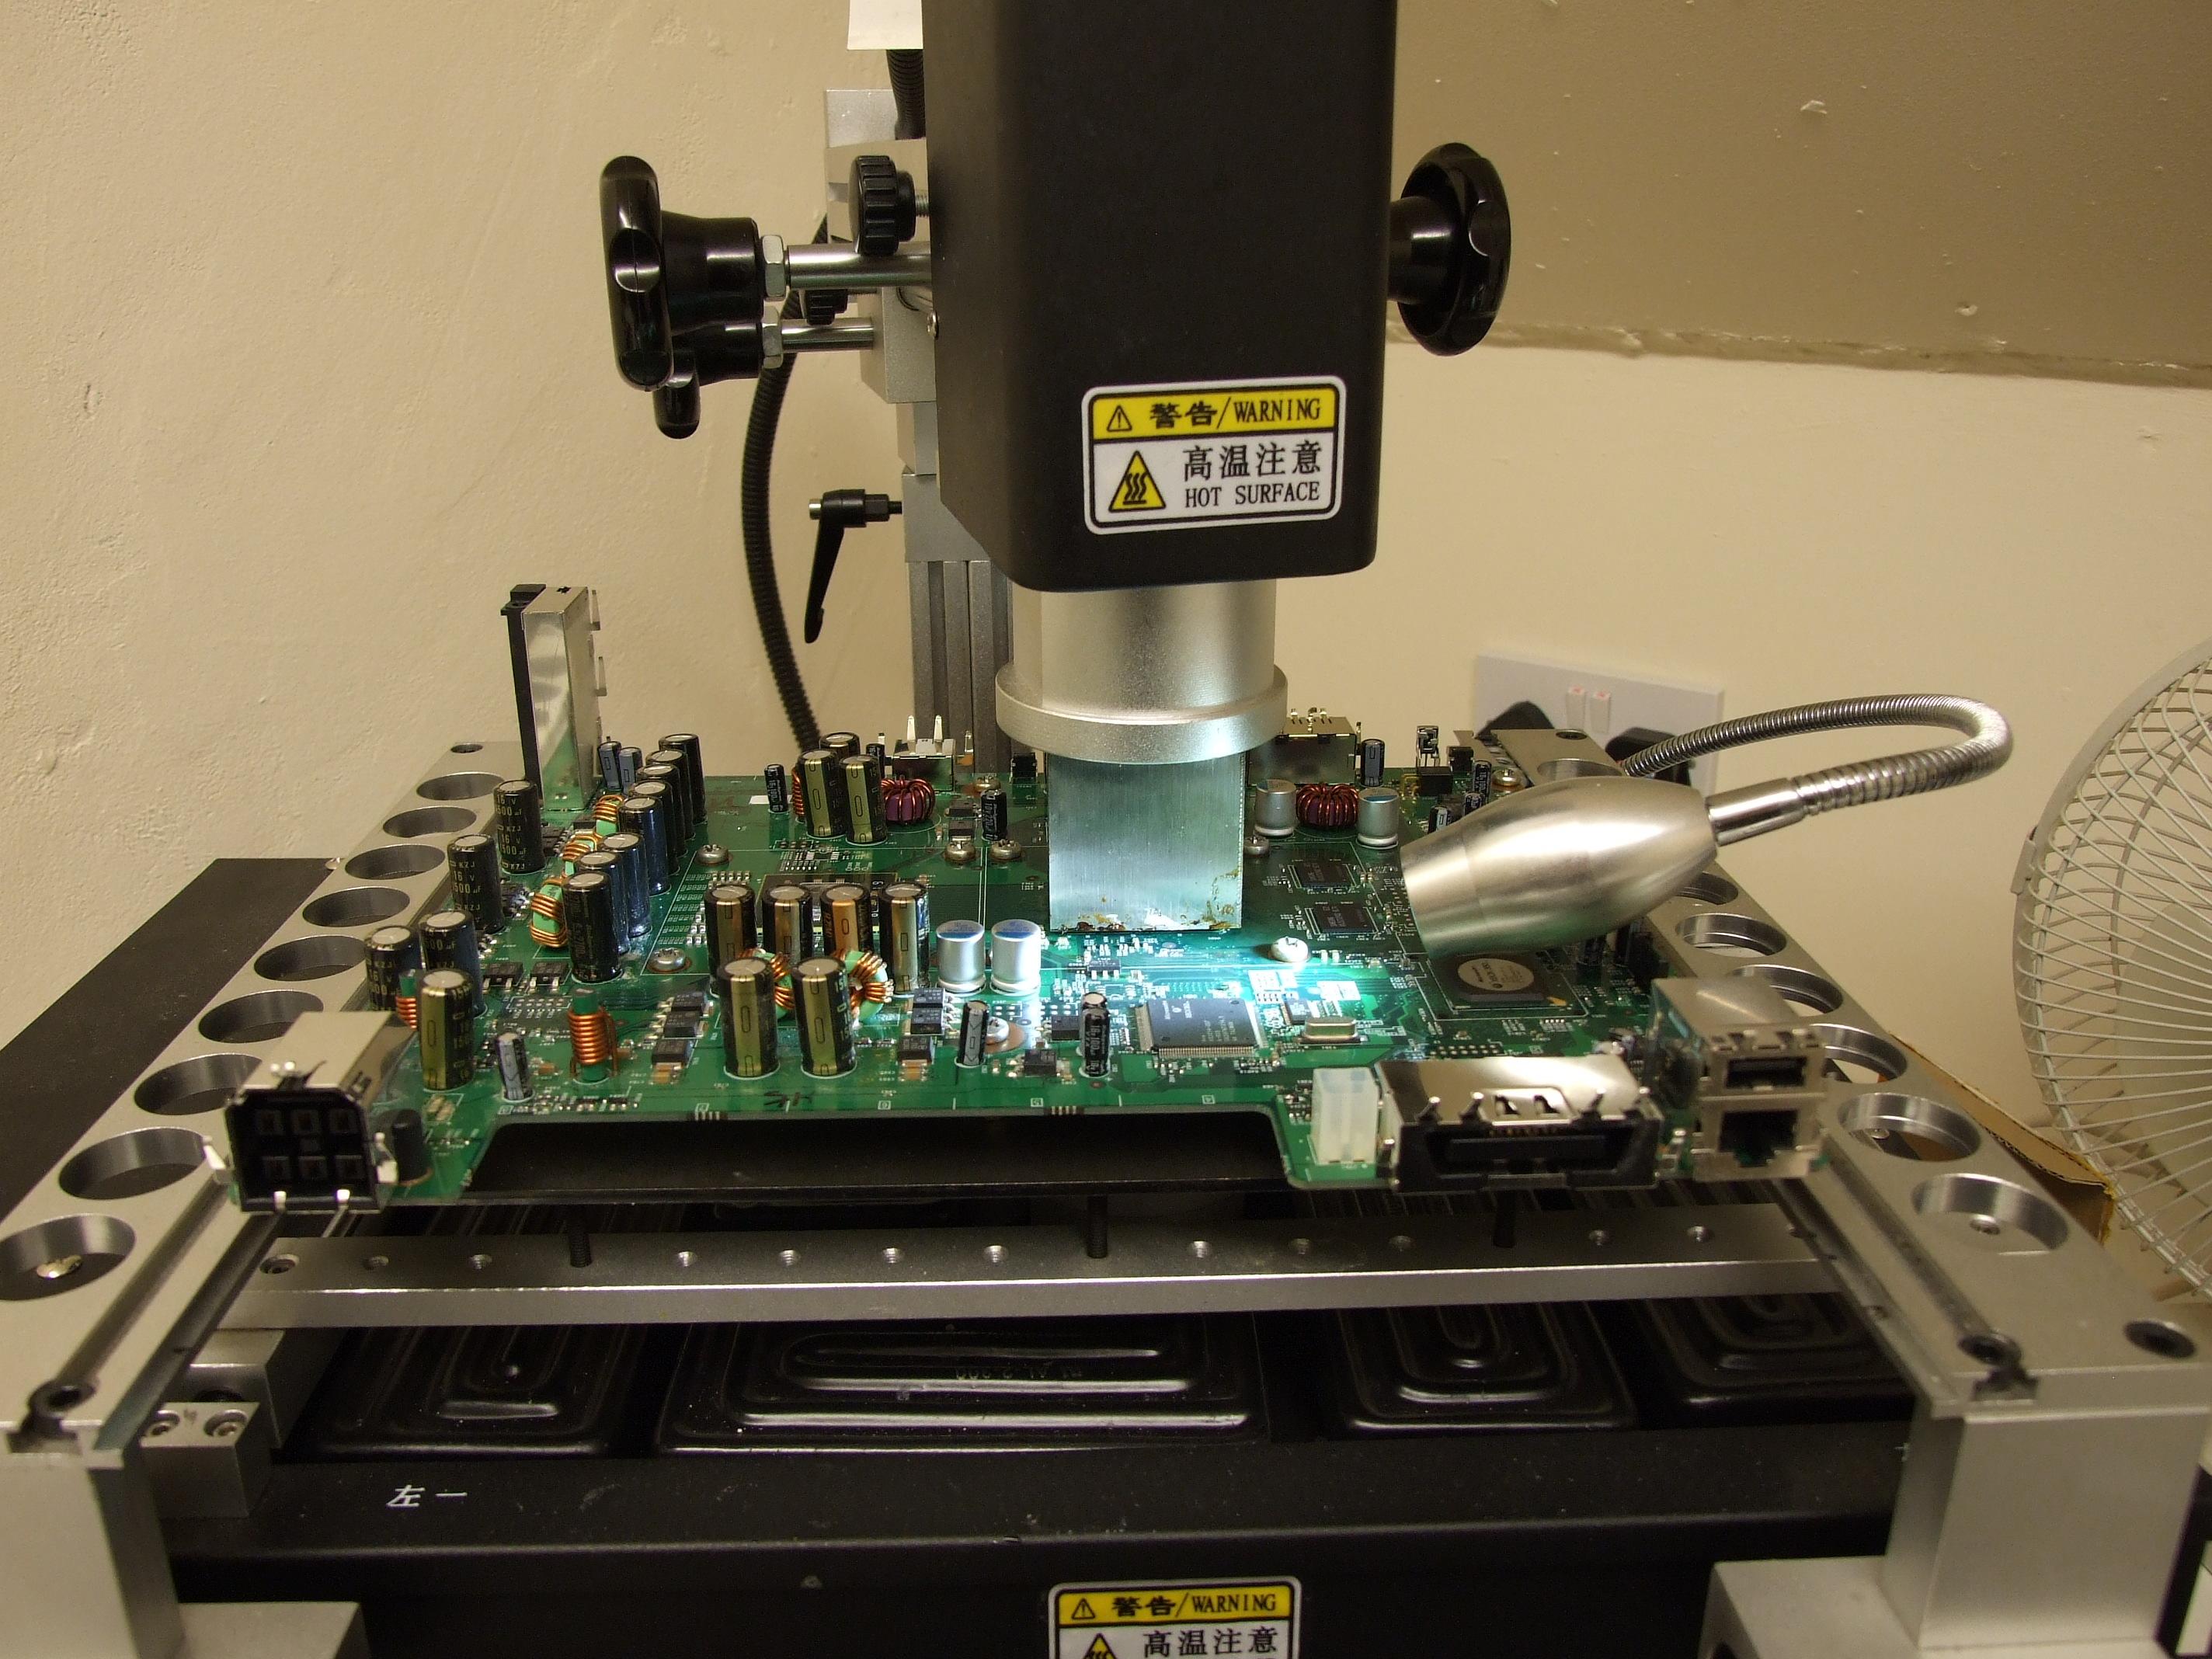 Console Repair Xbox 360 Gpu Reflow